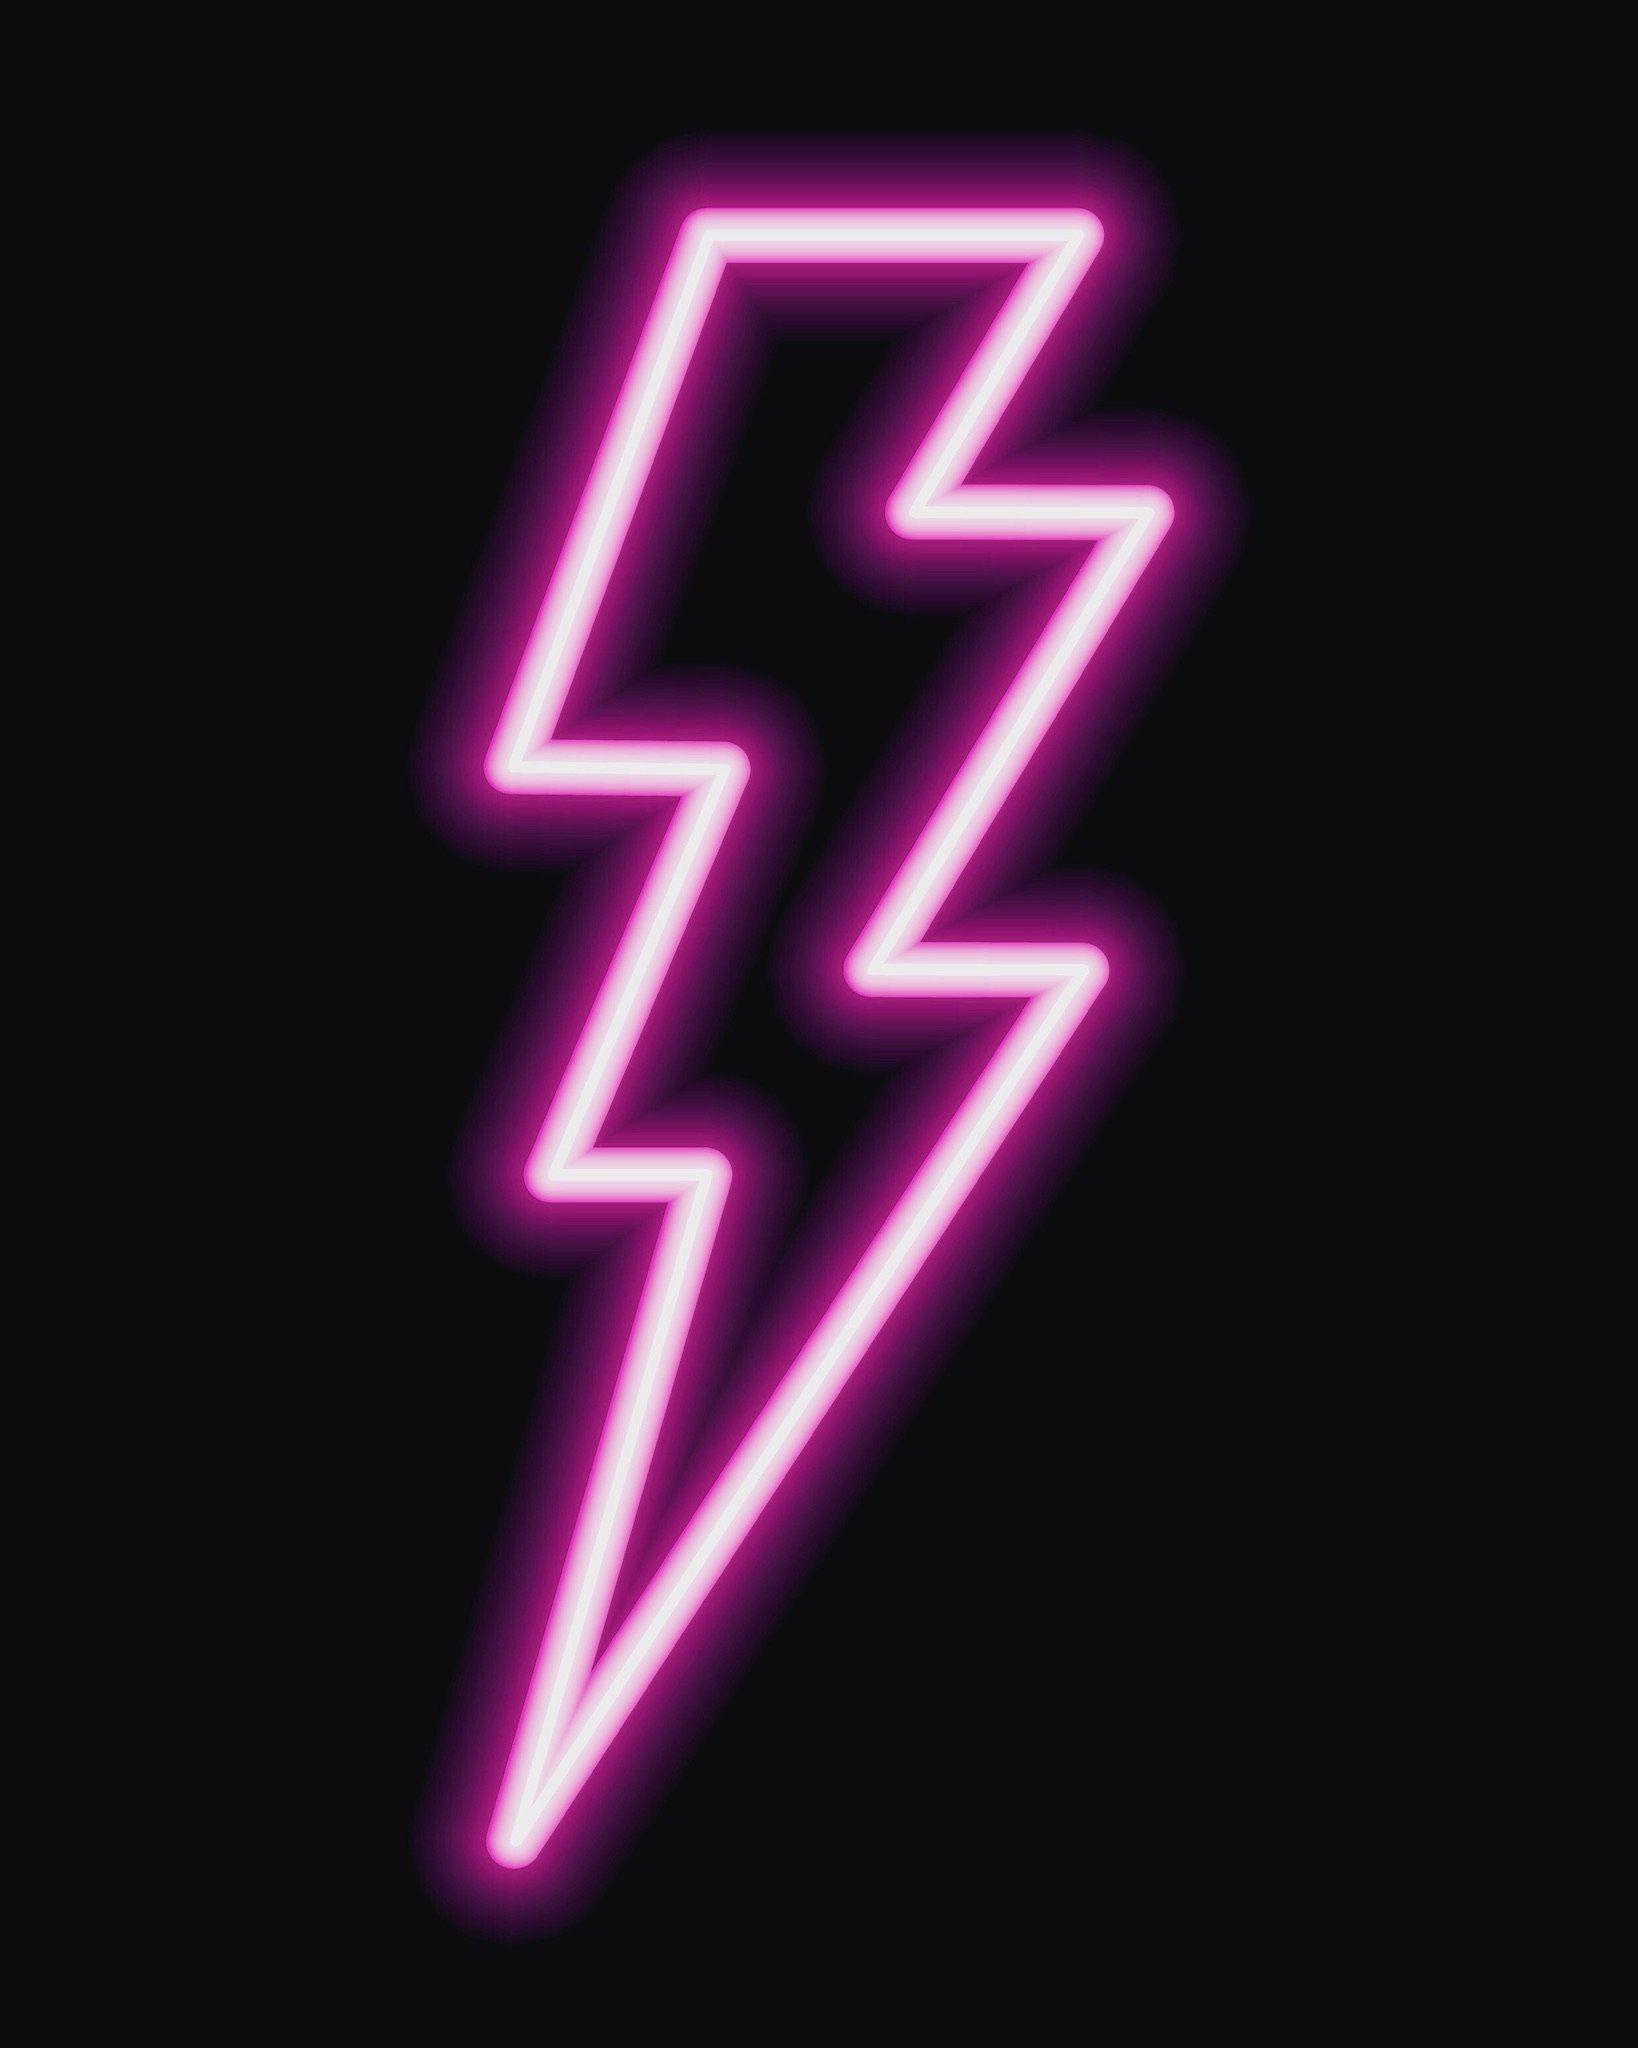 Neon Prints: Lightening Bolt, Lyrics or any word